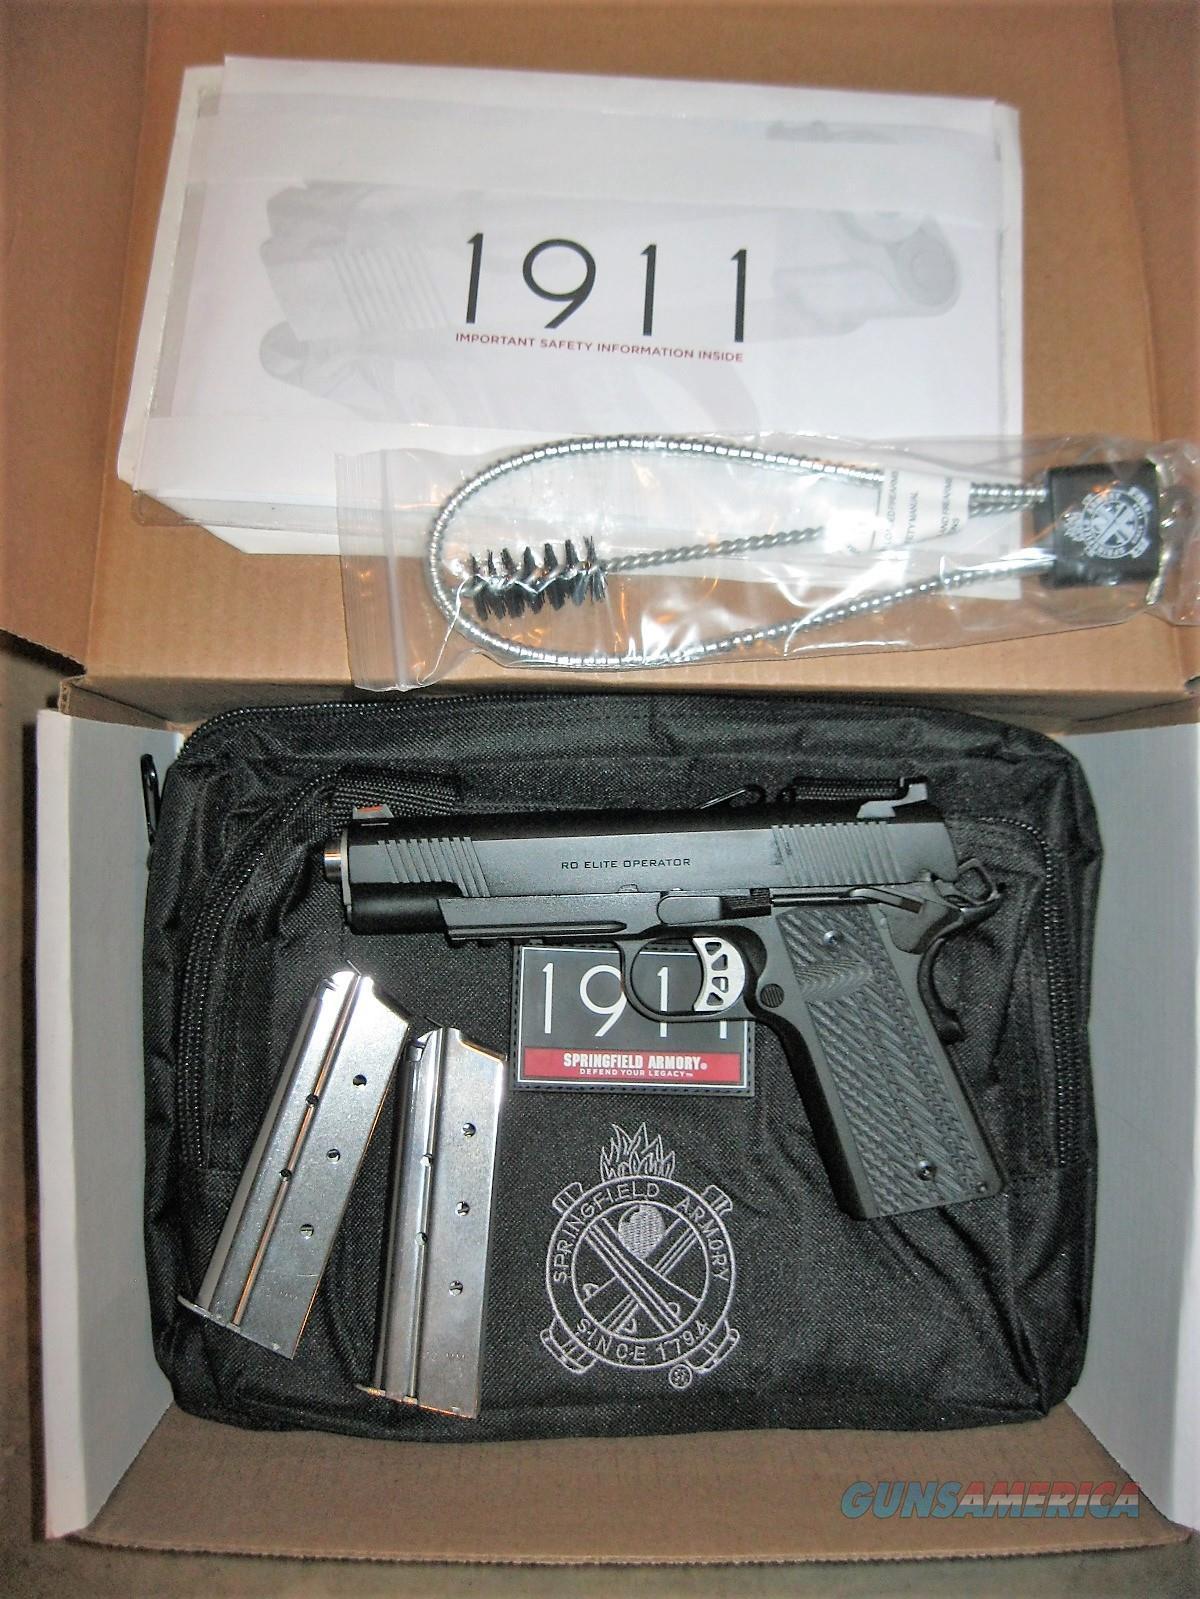 "Springfield 1911 RO Elite Operator 10mm 5"" Range Bag PI9110E *NEW*  Guns > Pistols > Springfield Armory Pistols > 1911 Type"